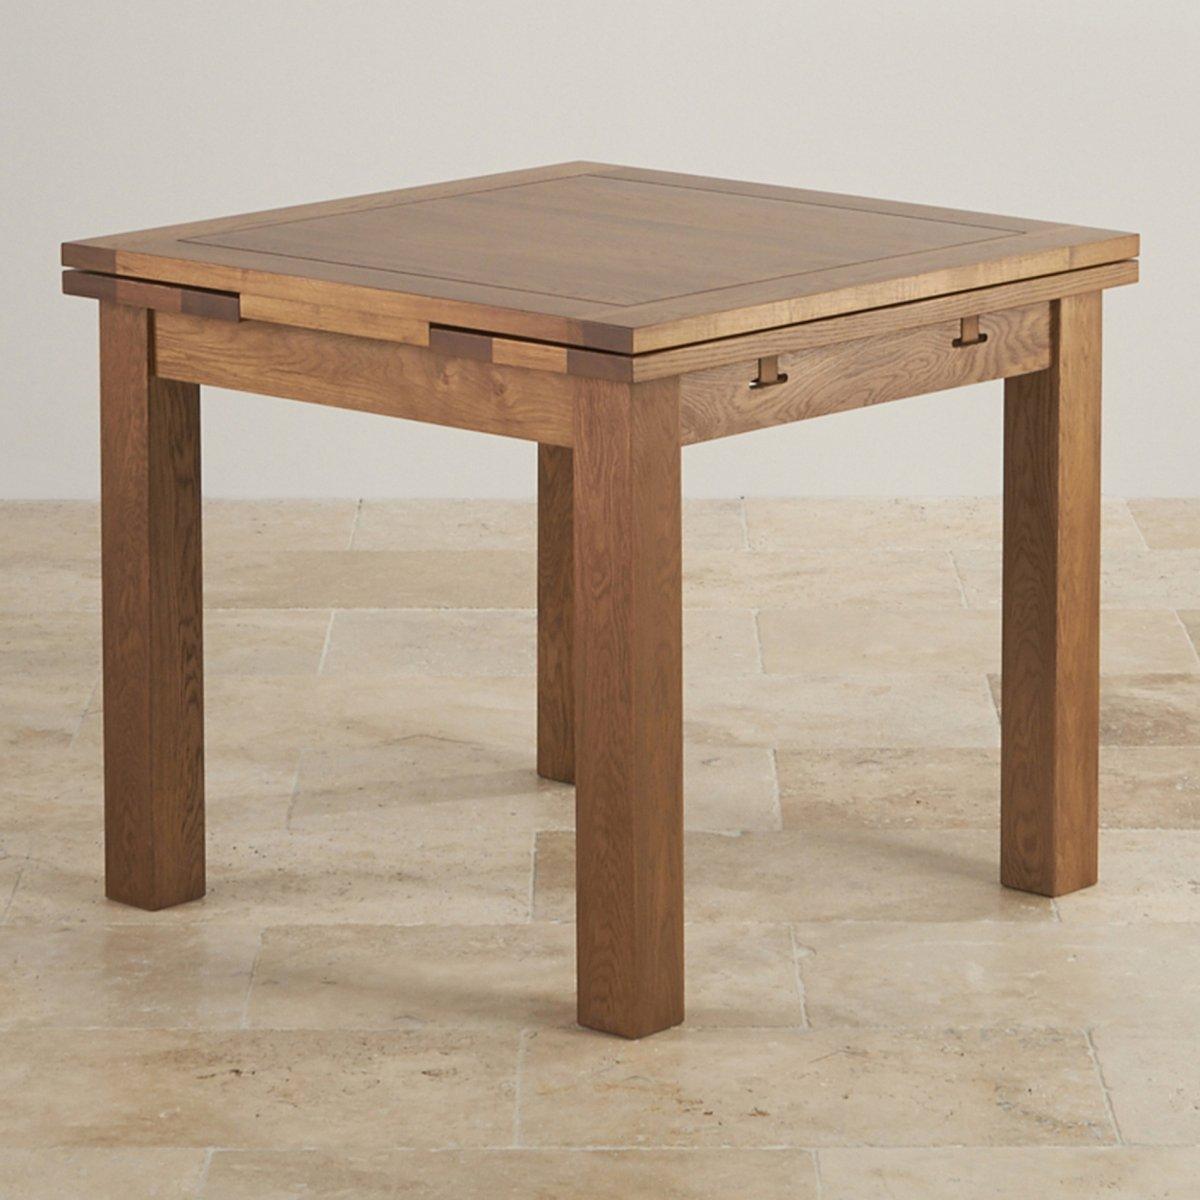 3ft x 3ft rustic oak extending dining table oak for Oak extending dining table